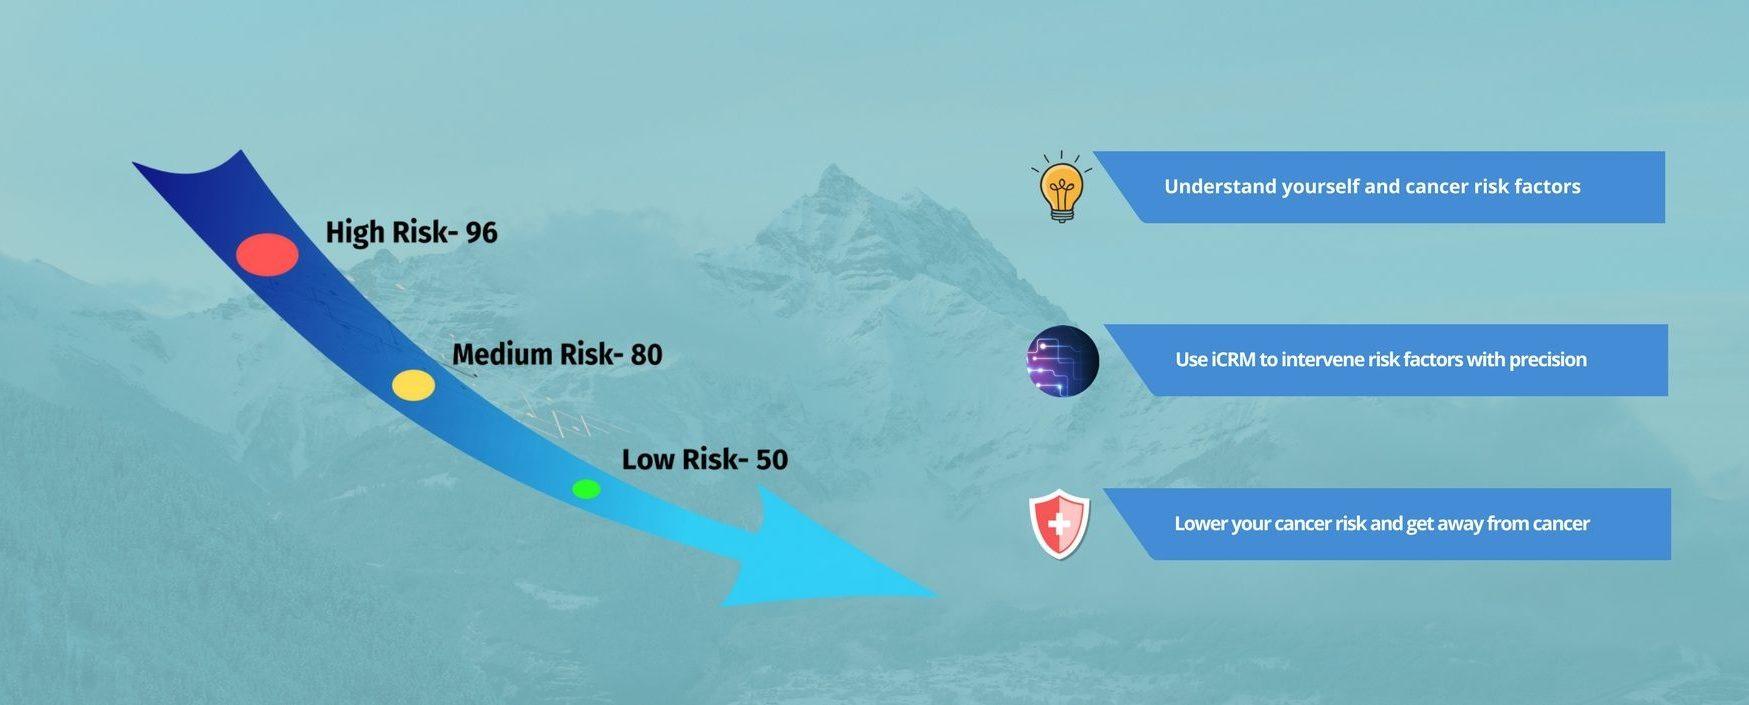 lower cancer risk